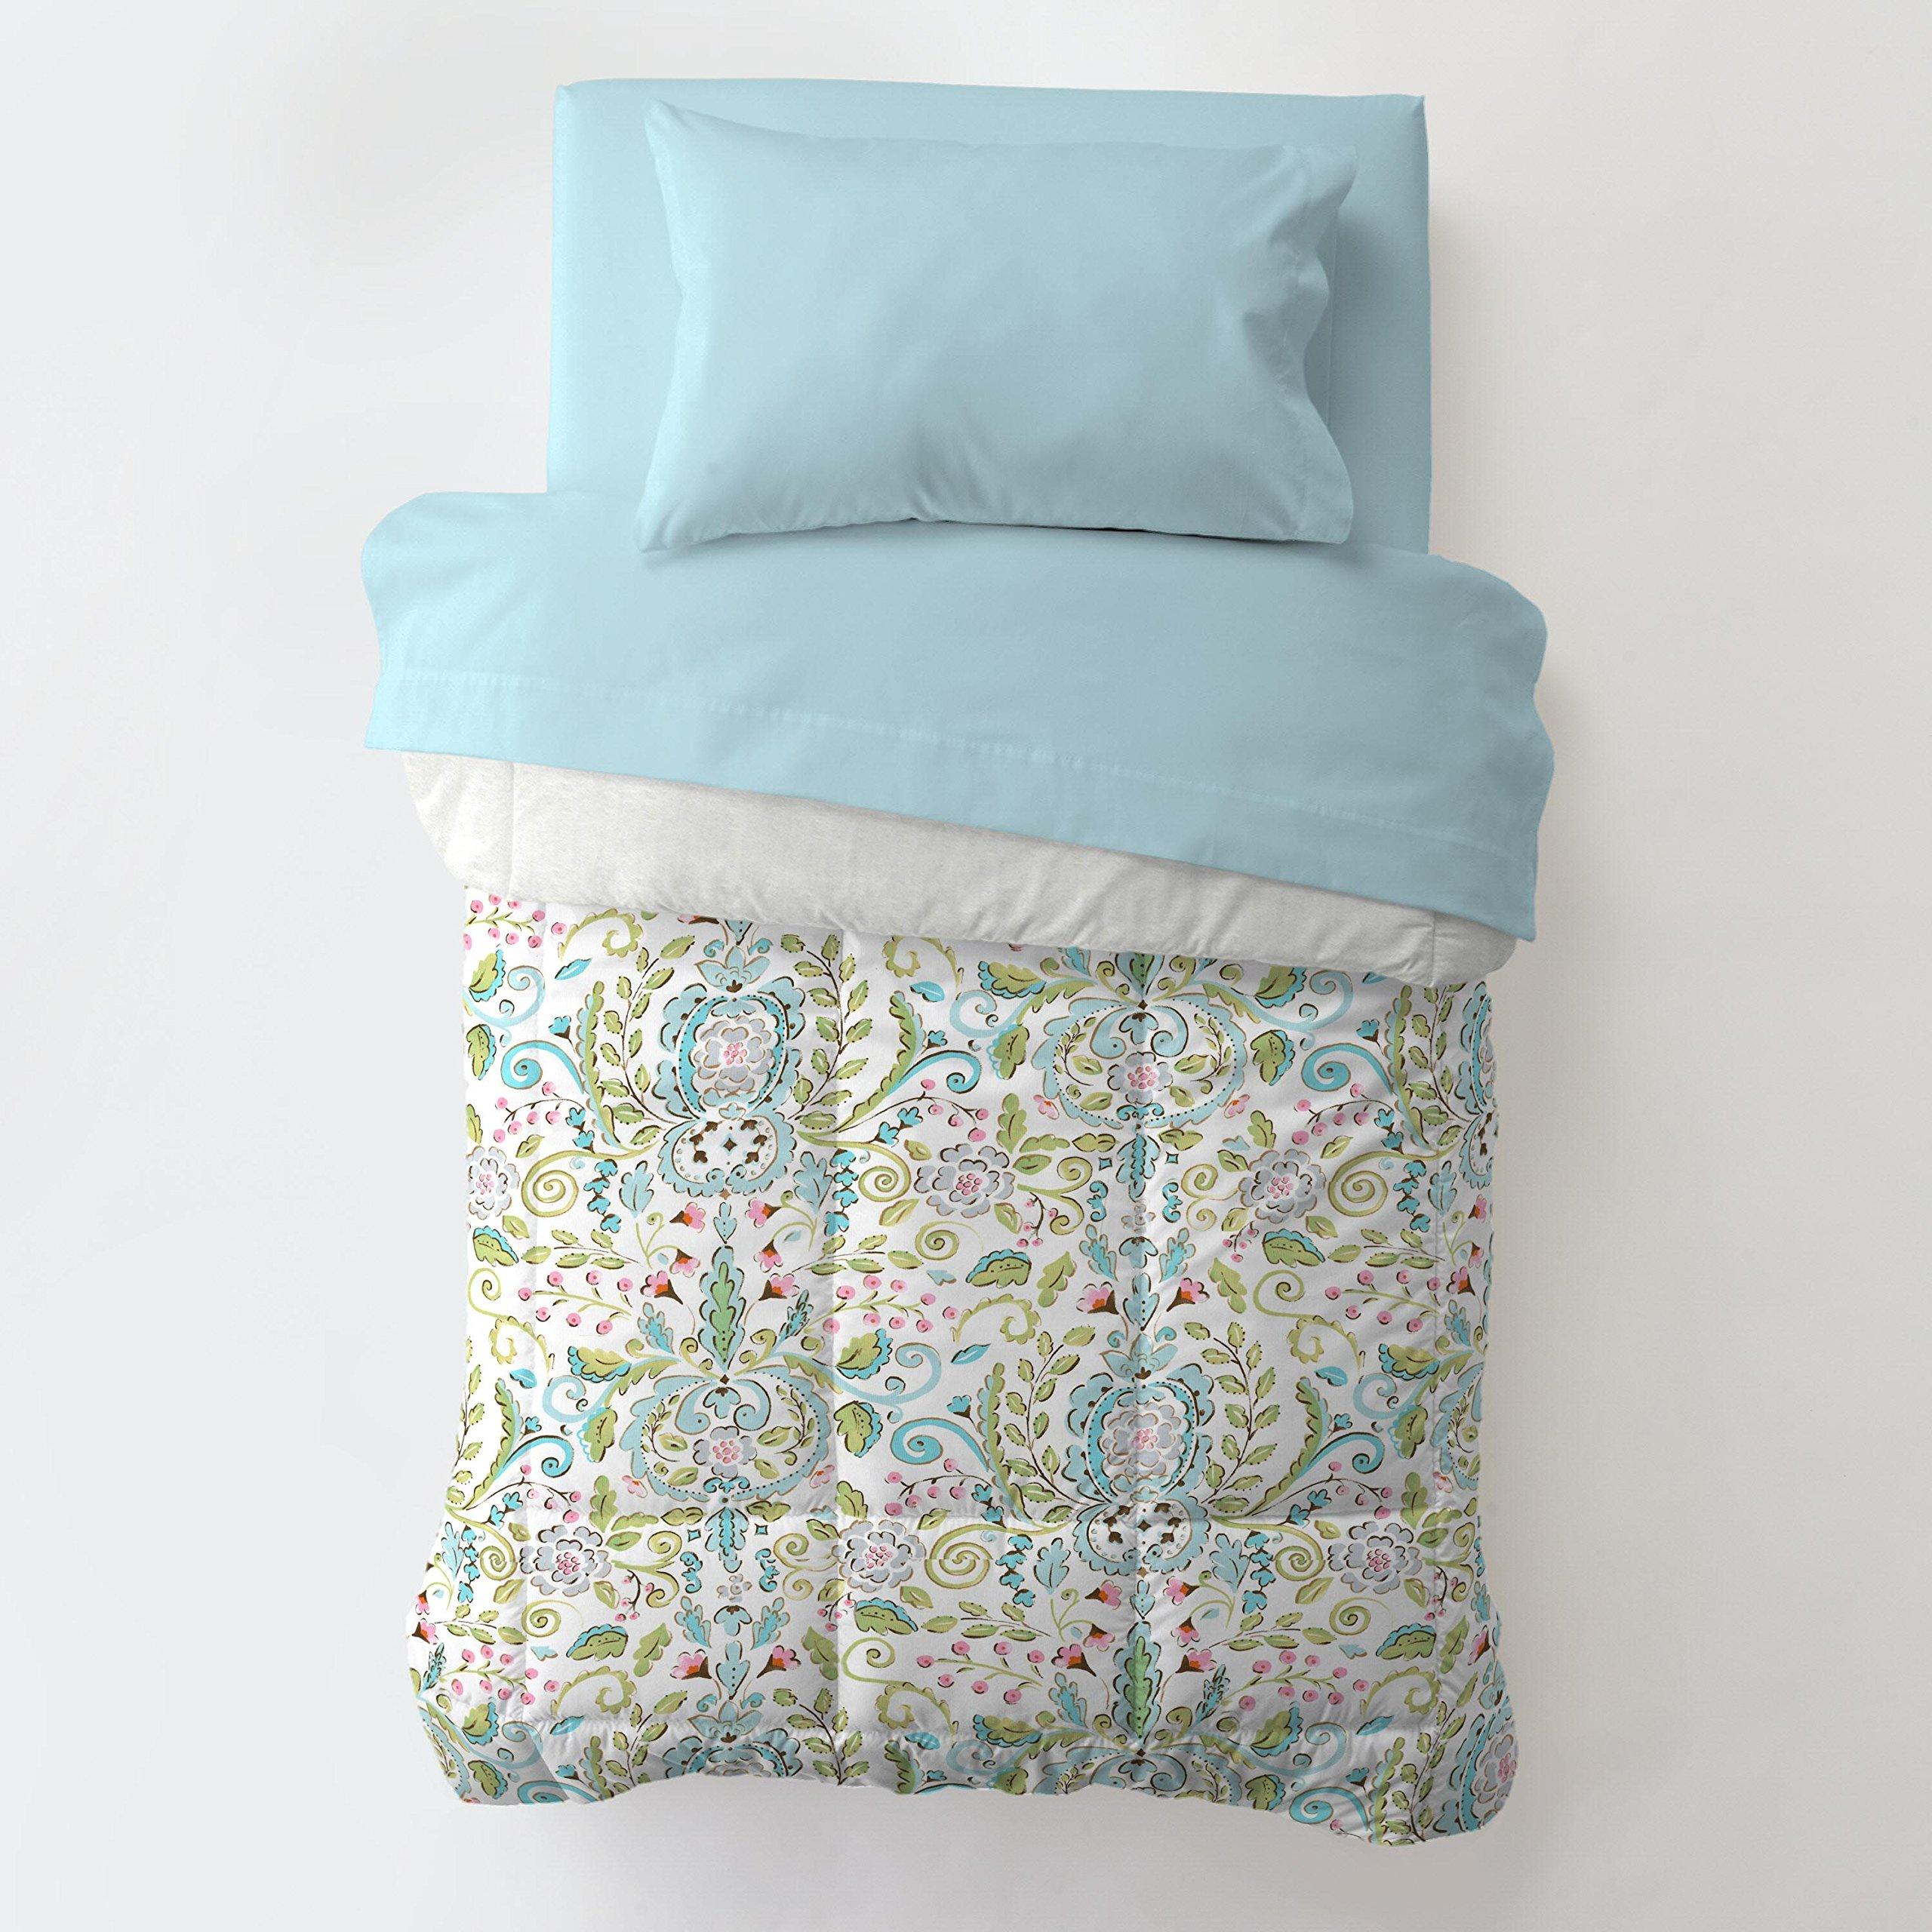 Carousel Designs Bebe Jardin Toddler Bed Comforter by Carousel Designs